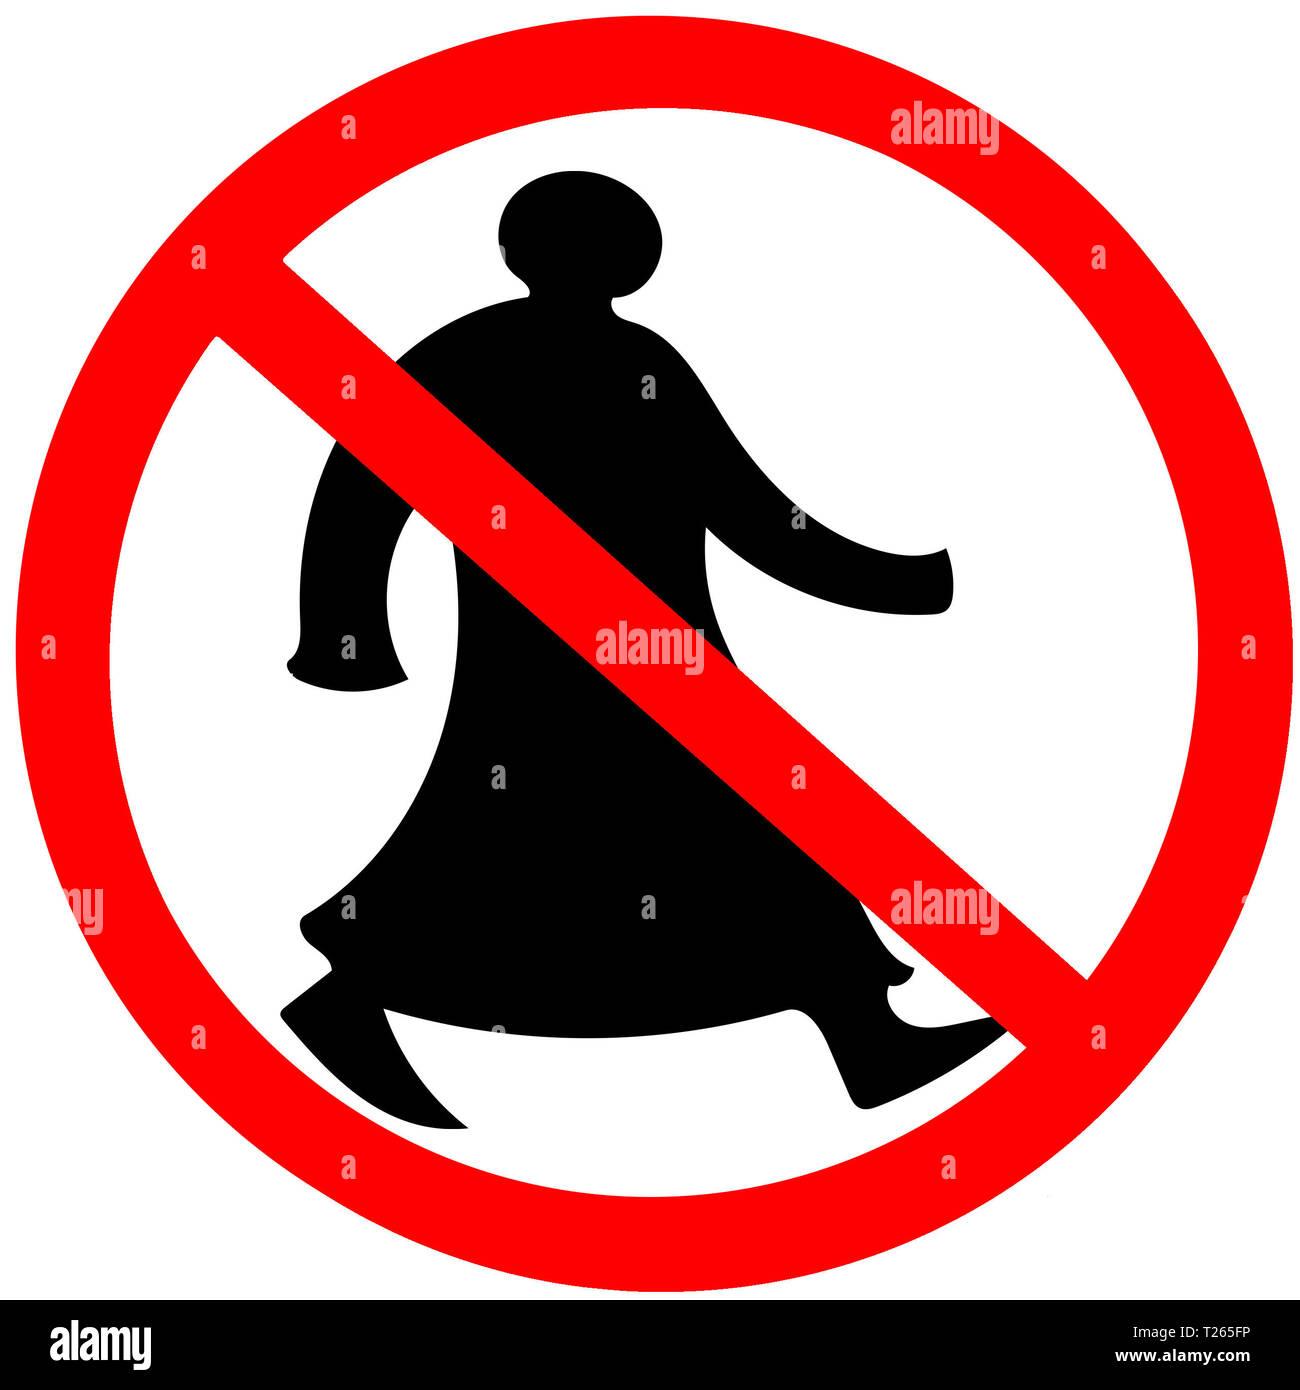 Walking arab circular prohibition road sign warning caution isolated - Stock Image